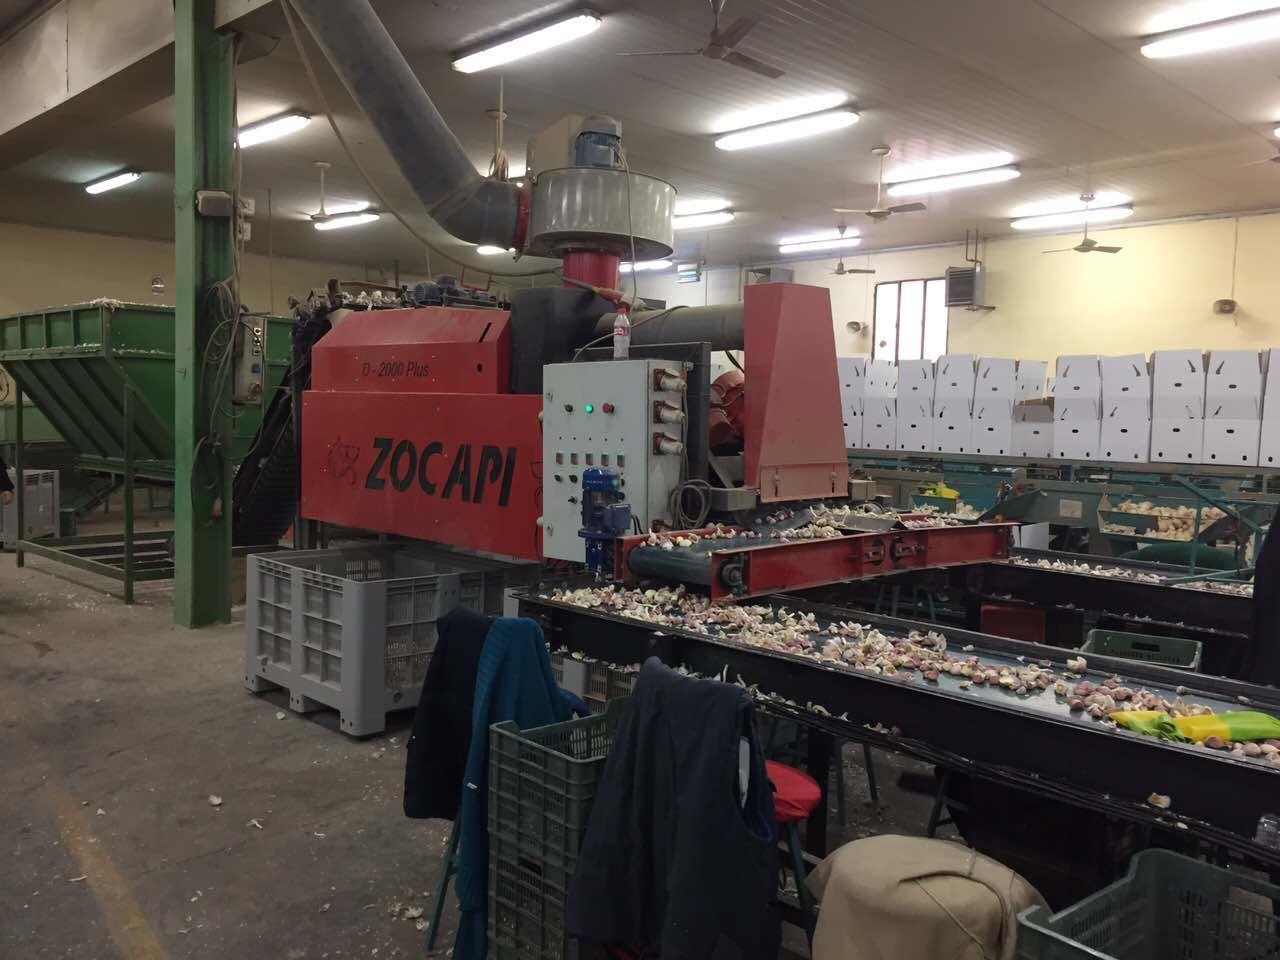 машина для разлущивания (разделения) чеснока на зубки испанской фирмы Zocapi